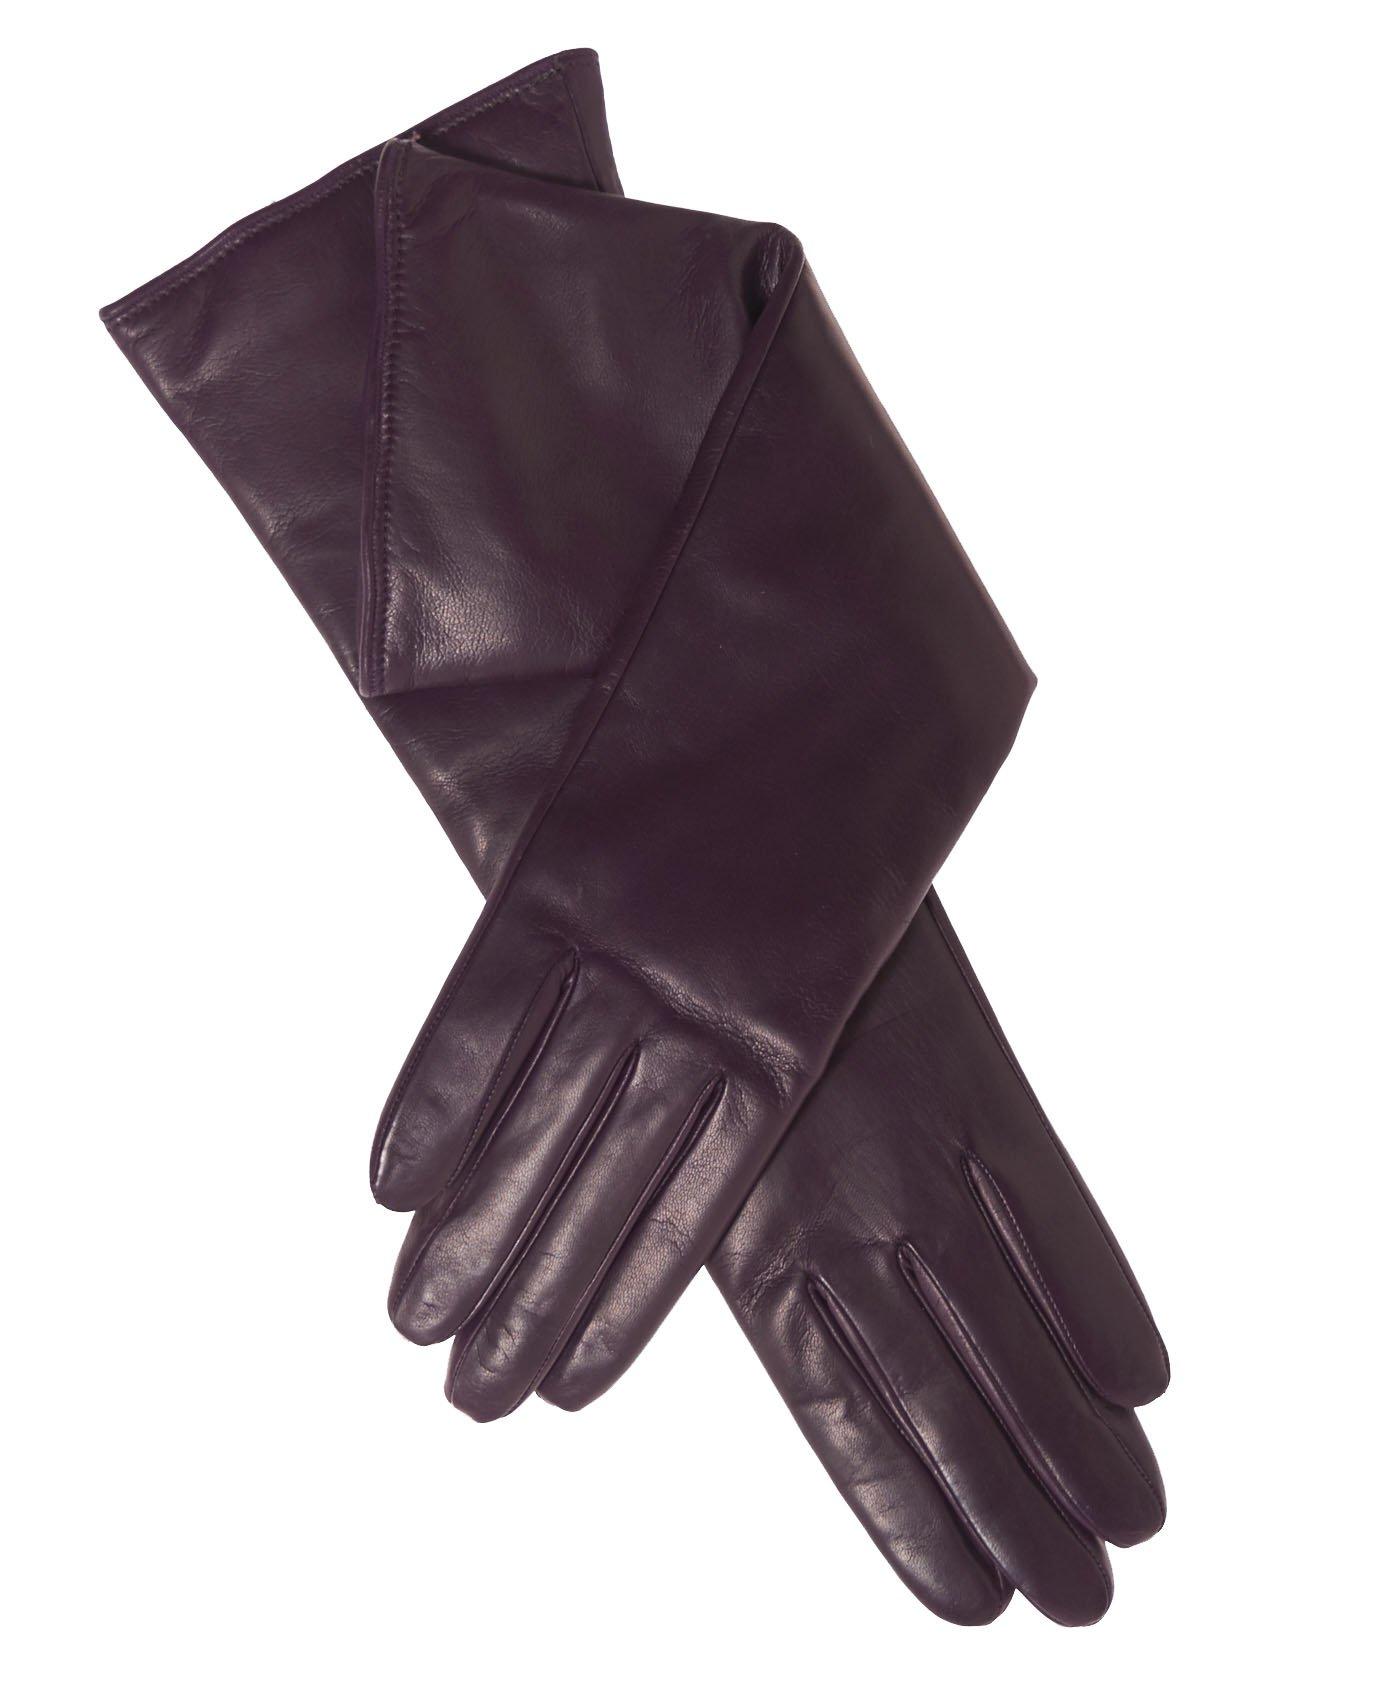 Fratelli Orsini Women's Italian''6 Button Length'' Cashmere Lined Leather Gloves Size 8 Color Blackgrape